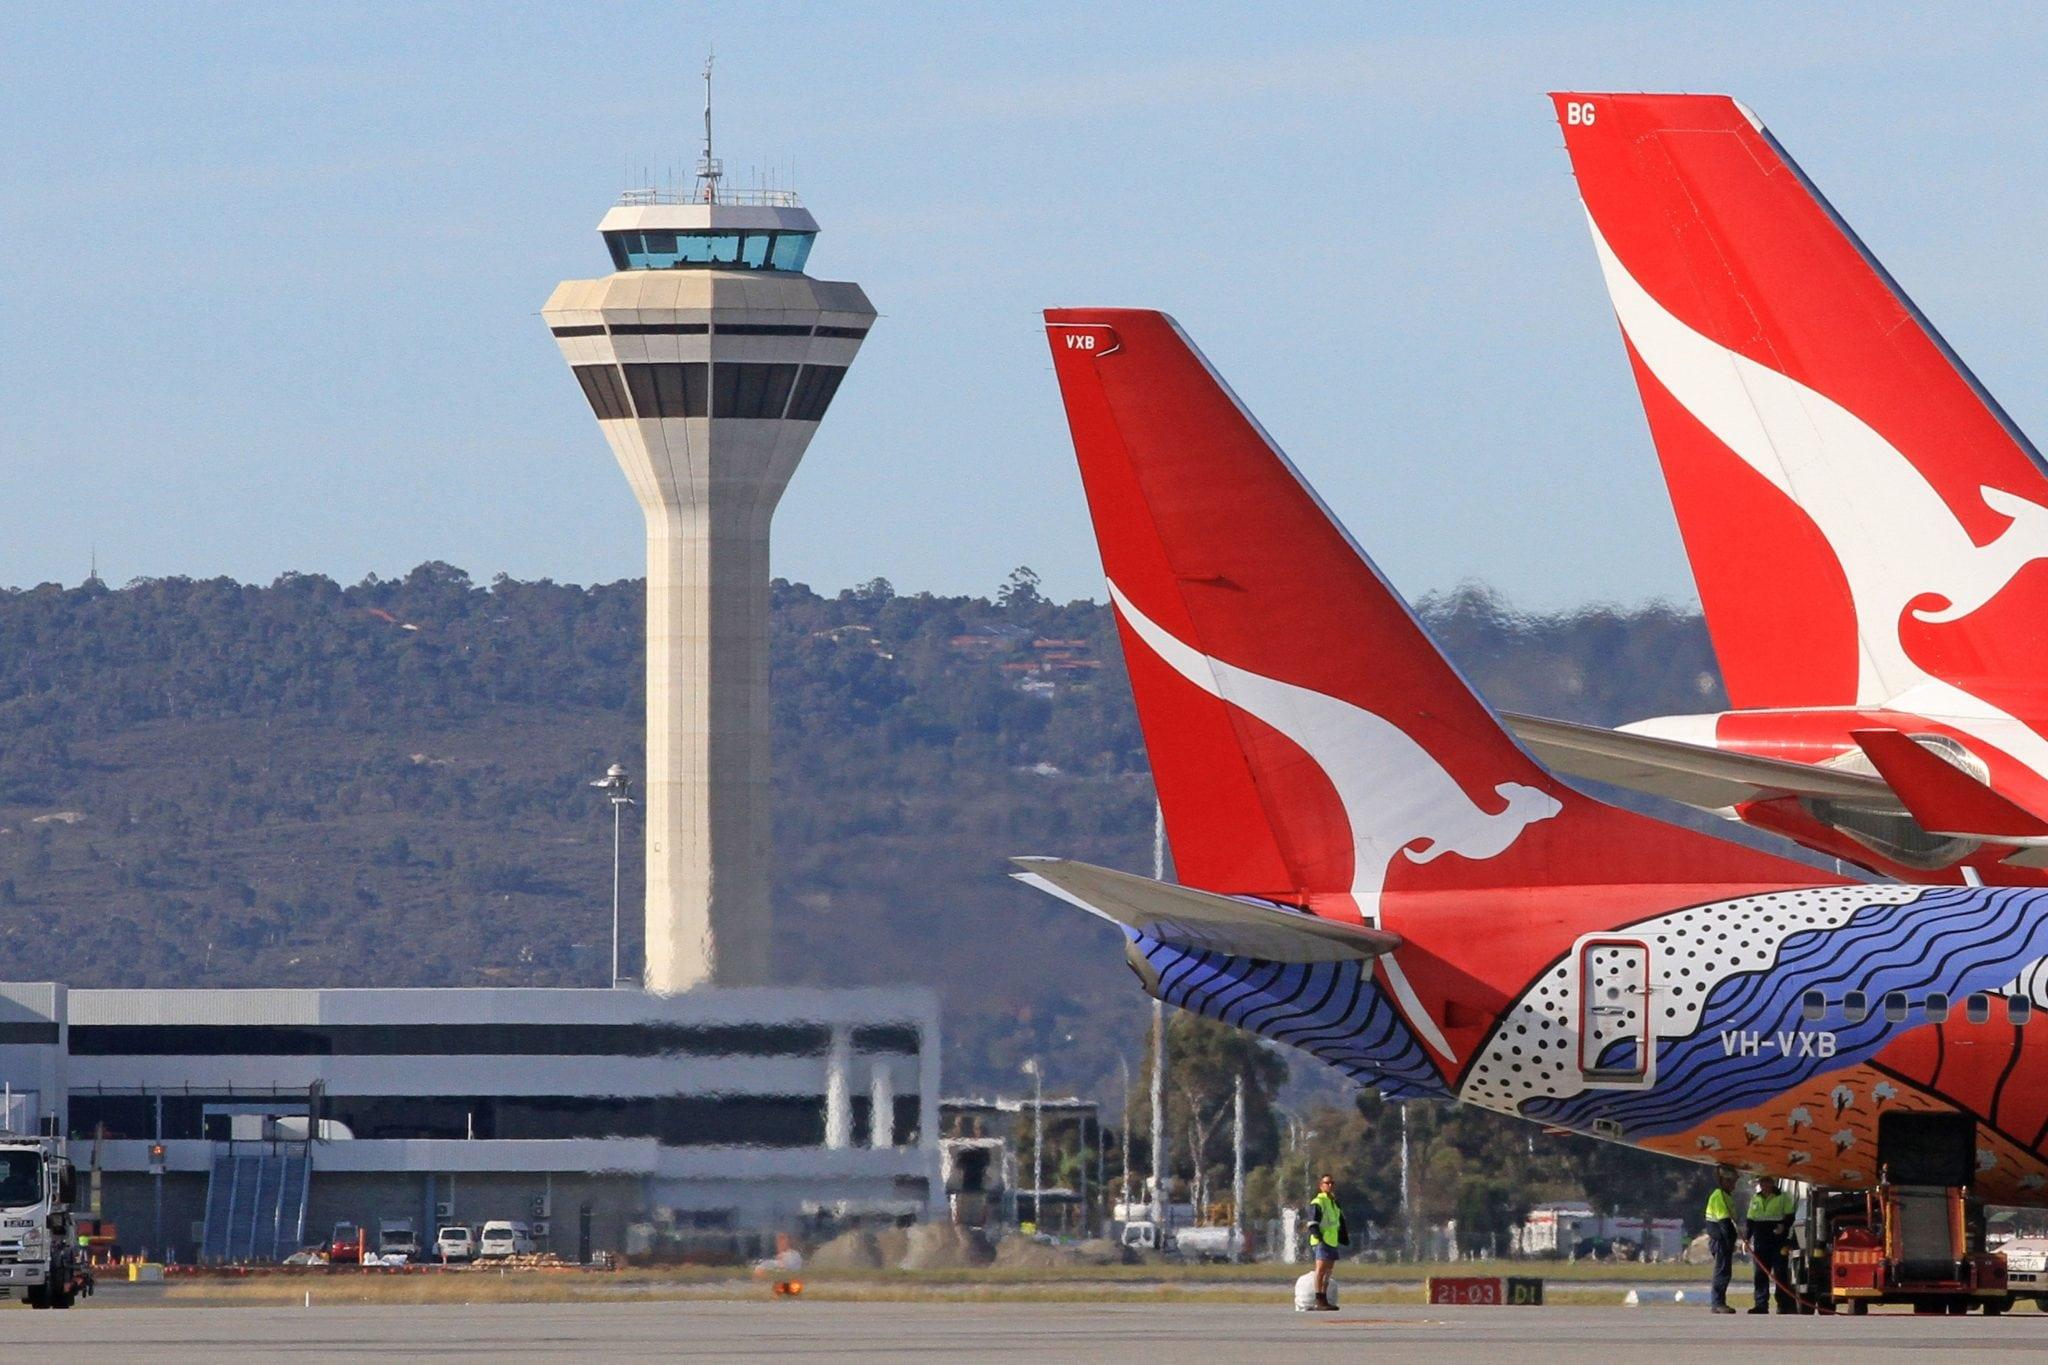 Air traffic control tower at Perth International Airport in Australia